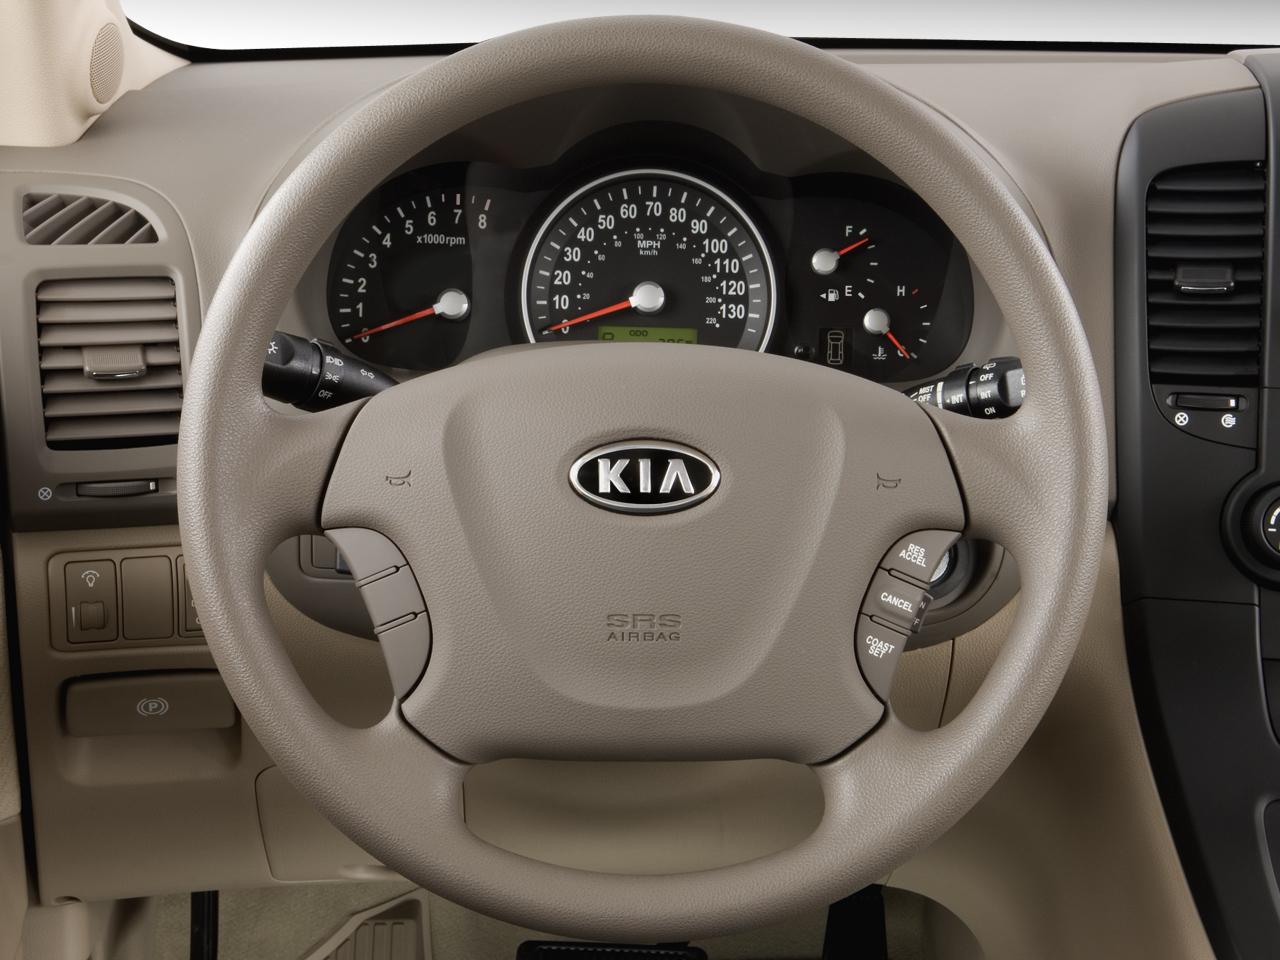 Mini Van Steering Wheel : Kia sedona minivan review road test automobile